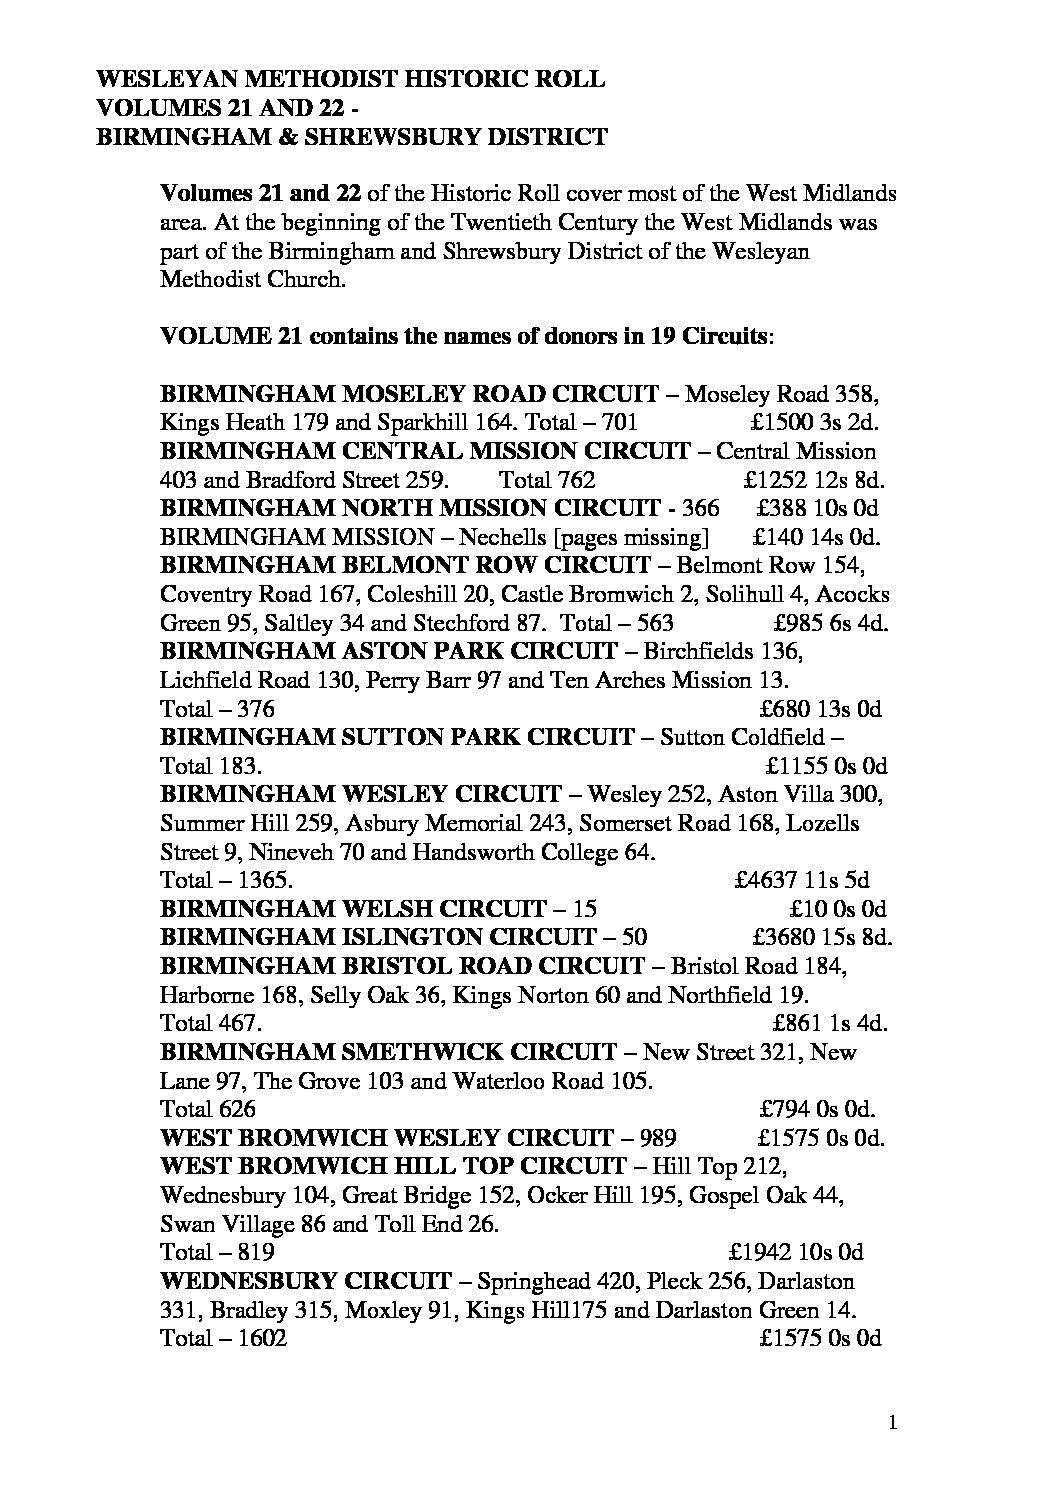 Wesleyan Historic Roll volume 22